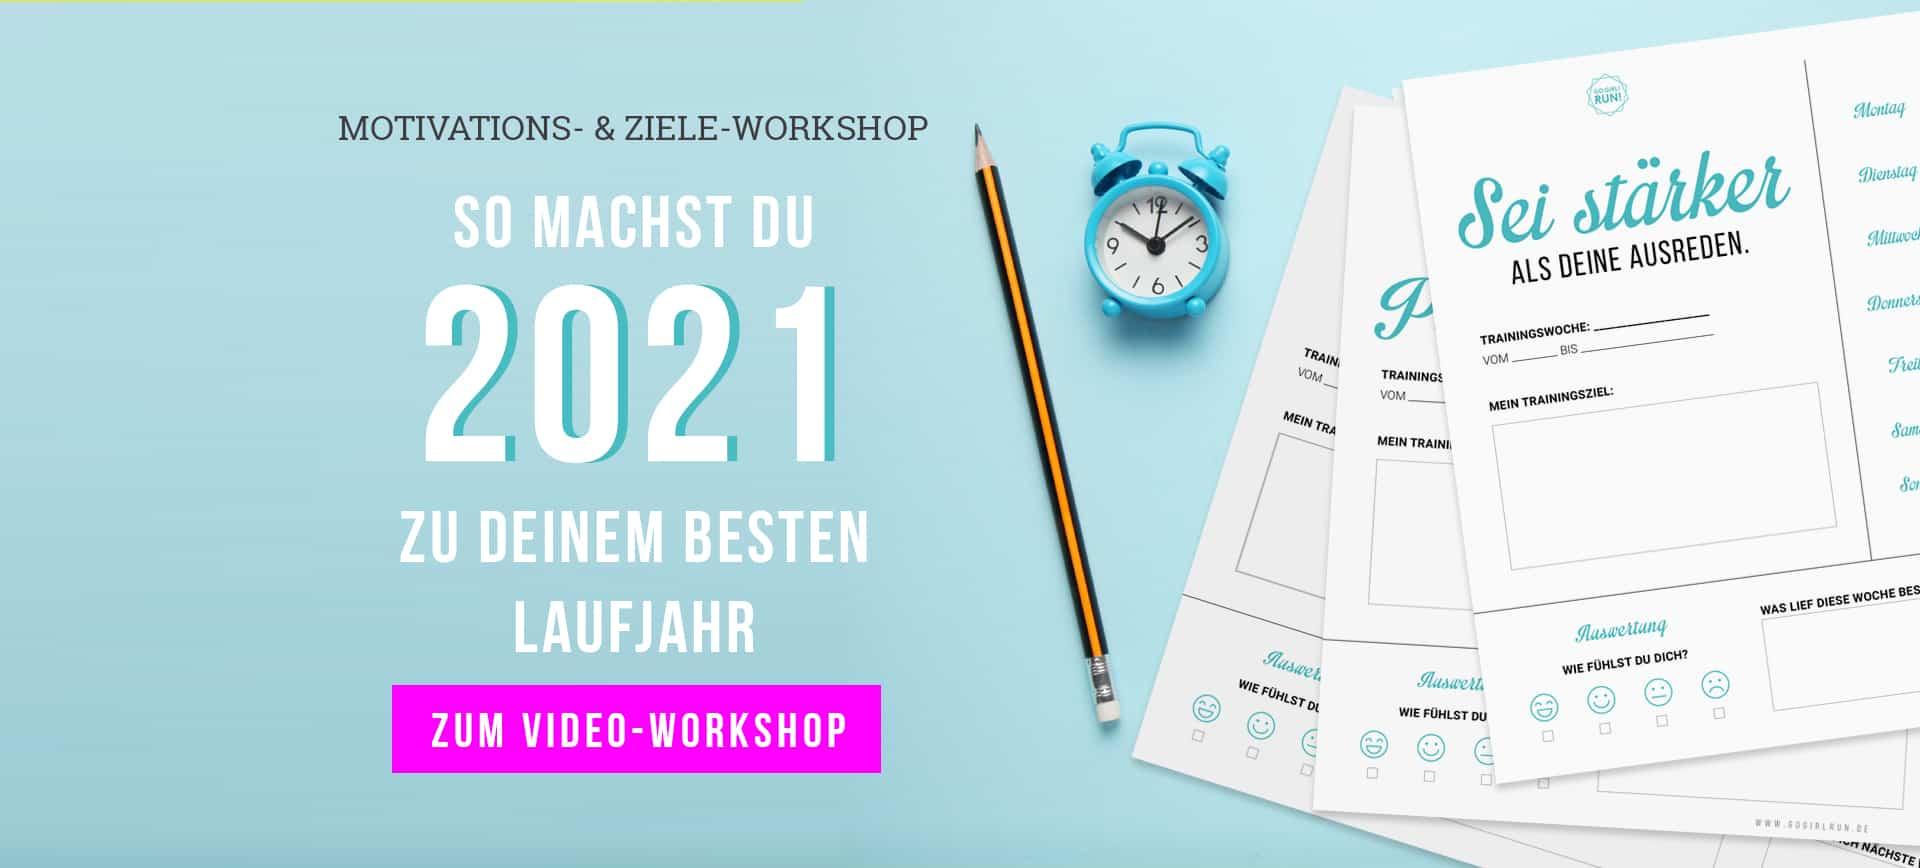 Motivations- & Ziele-Workshop